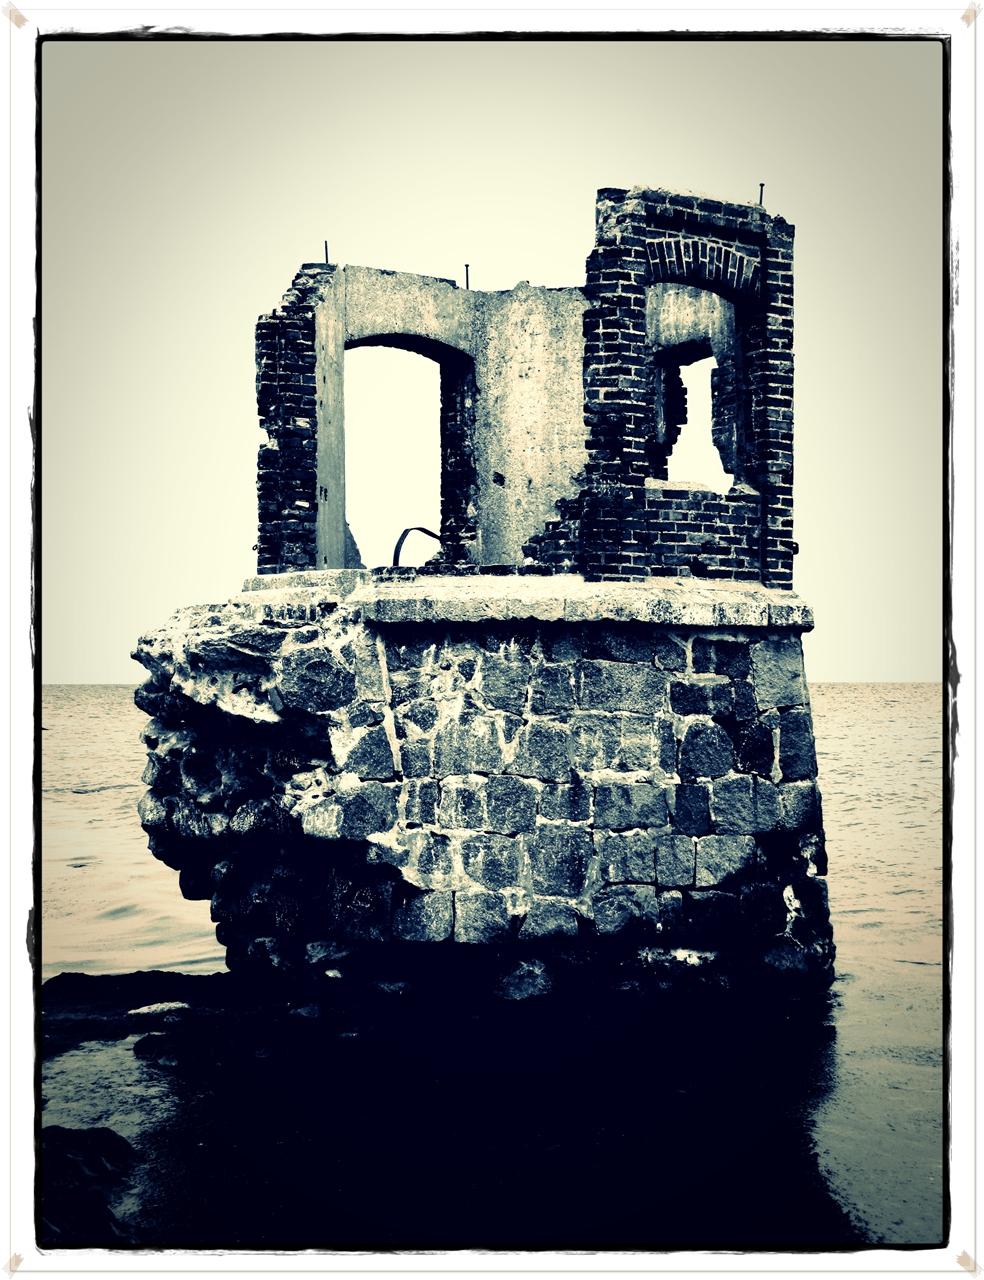 Die Ruine des Pegelturms in Kap Arkona